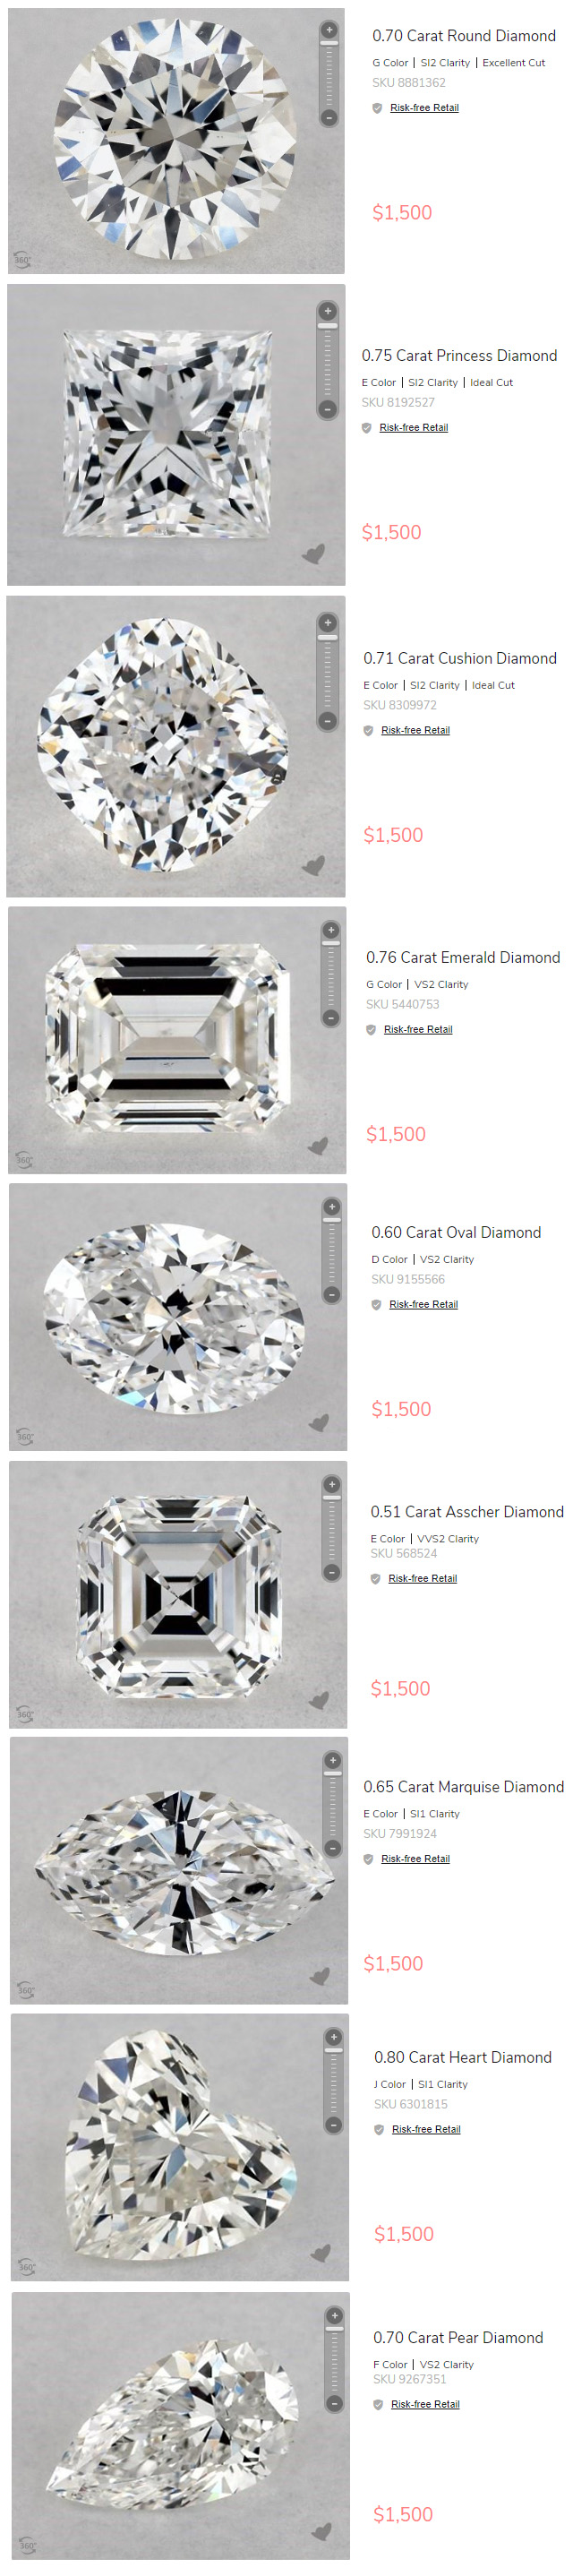 The Best Diamond For 1500 Dollars